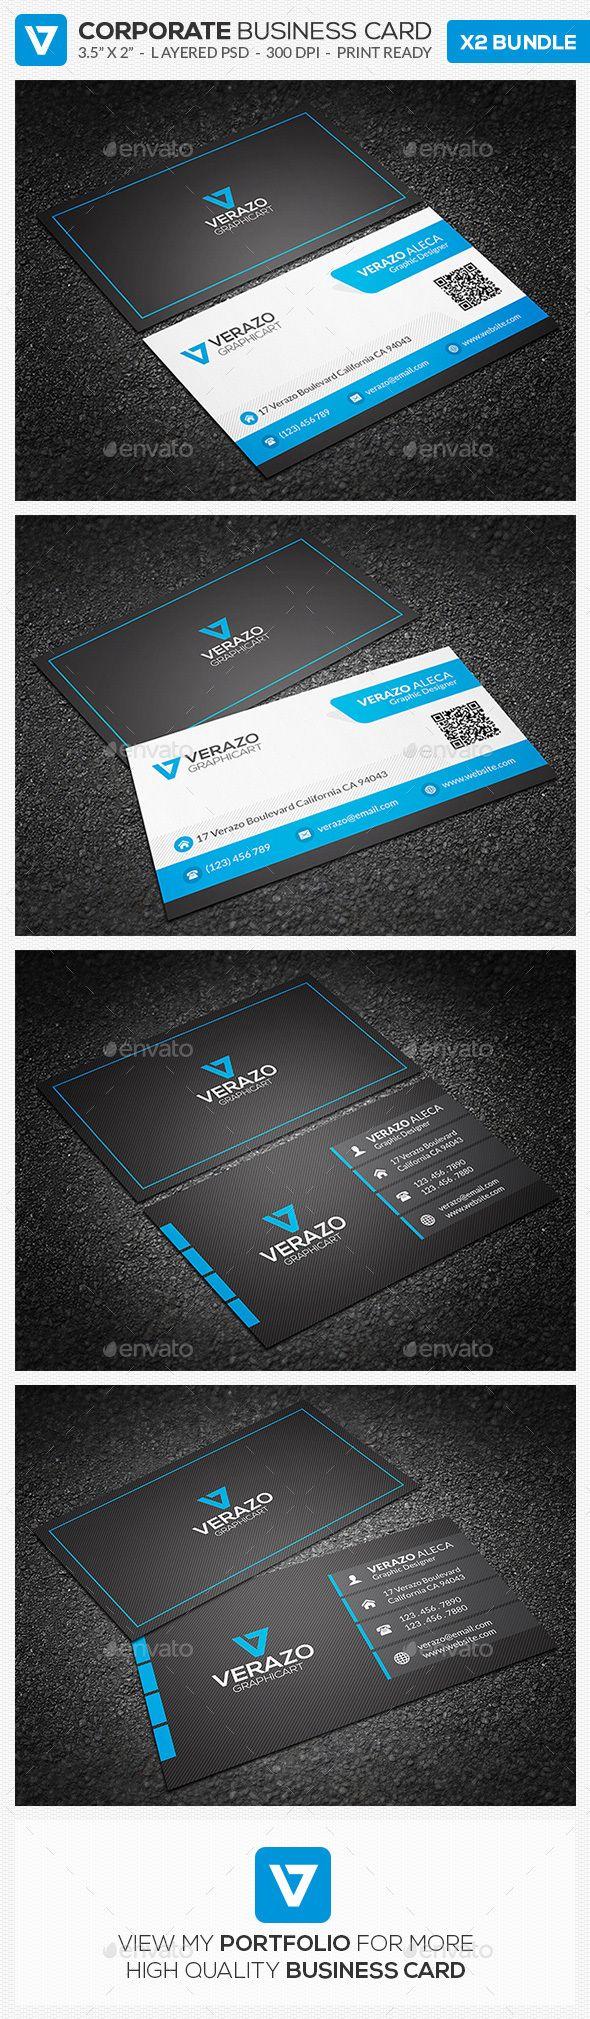 Business Card Bundle 25 Printing Business Cards Business Cards Creative High Quality Business Cards